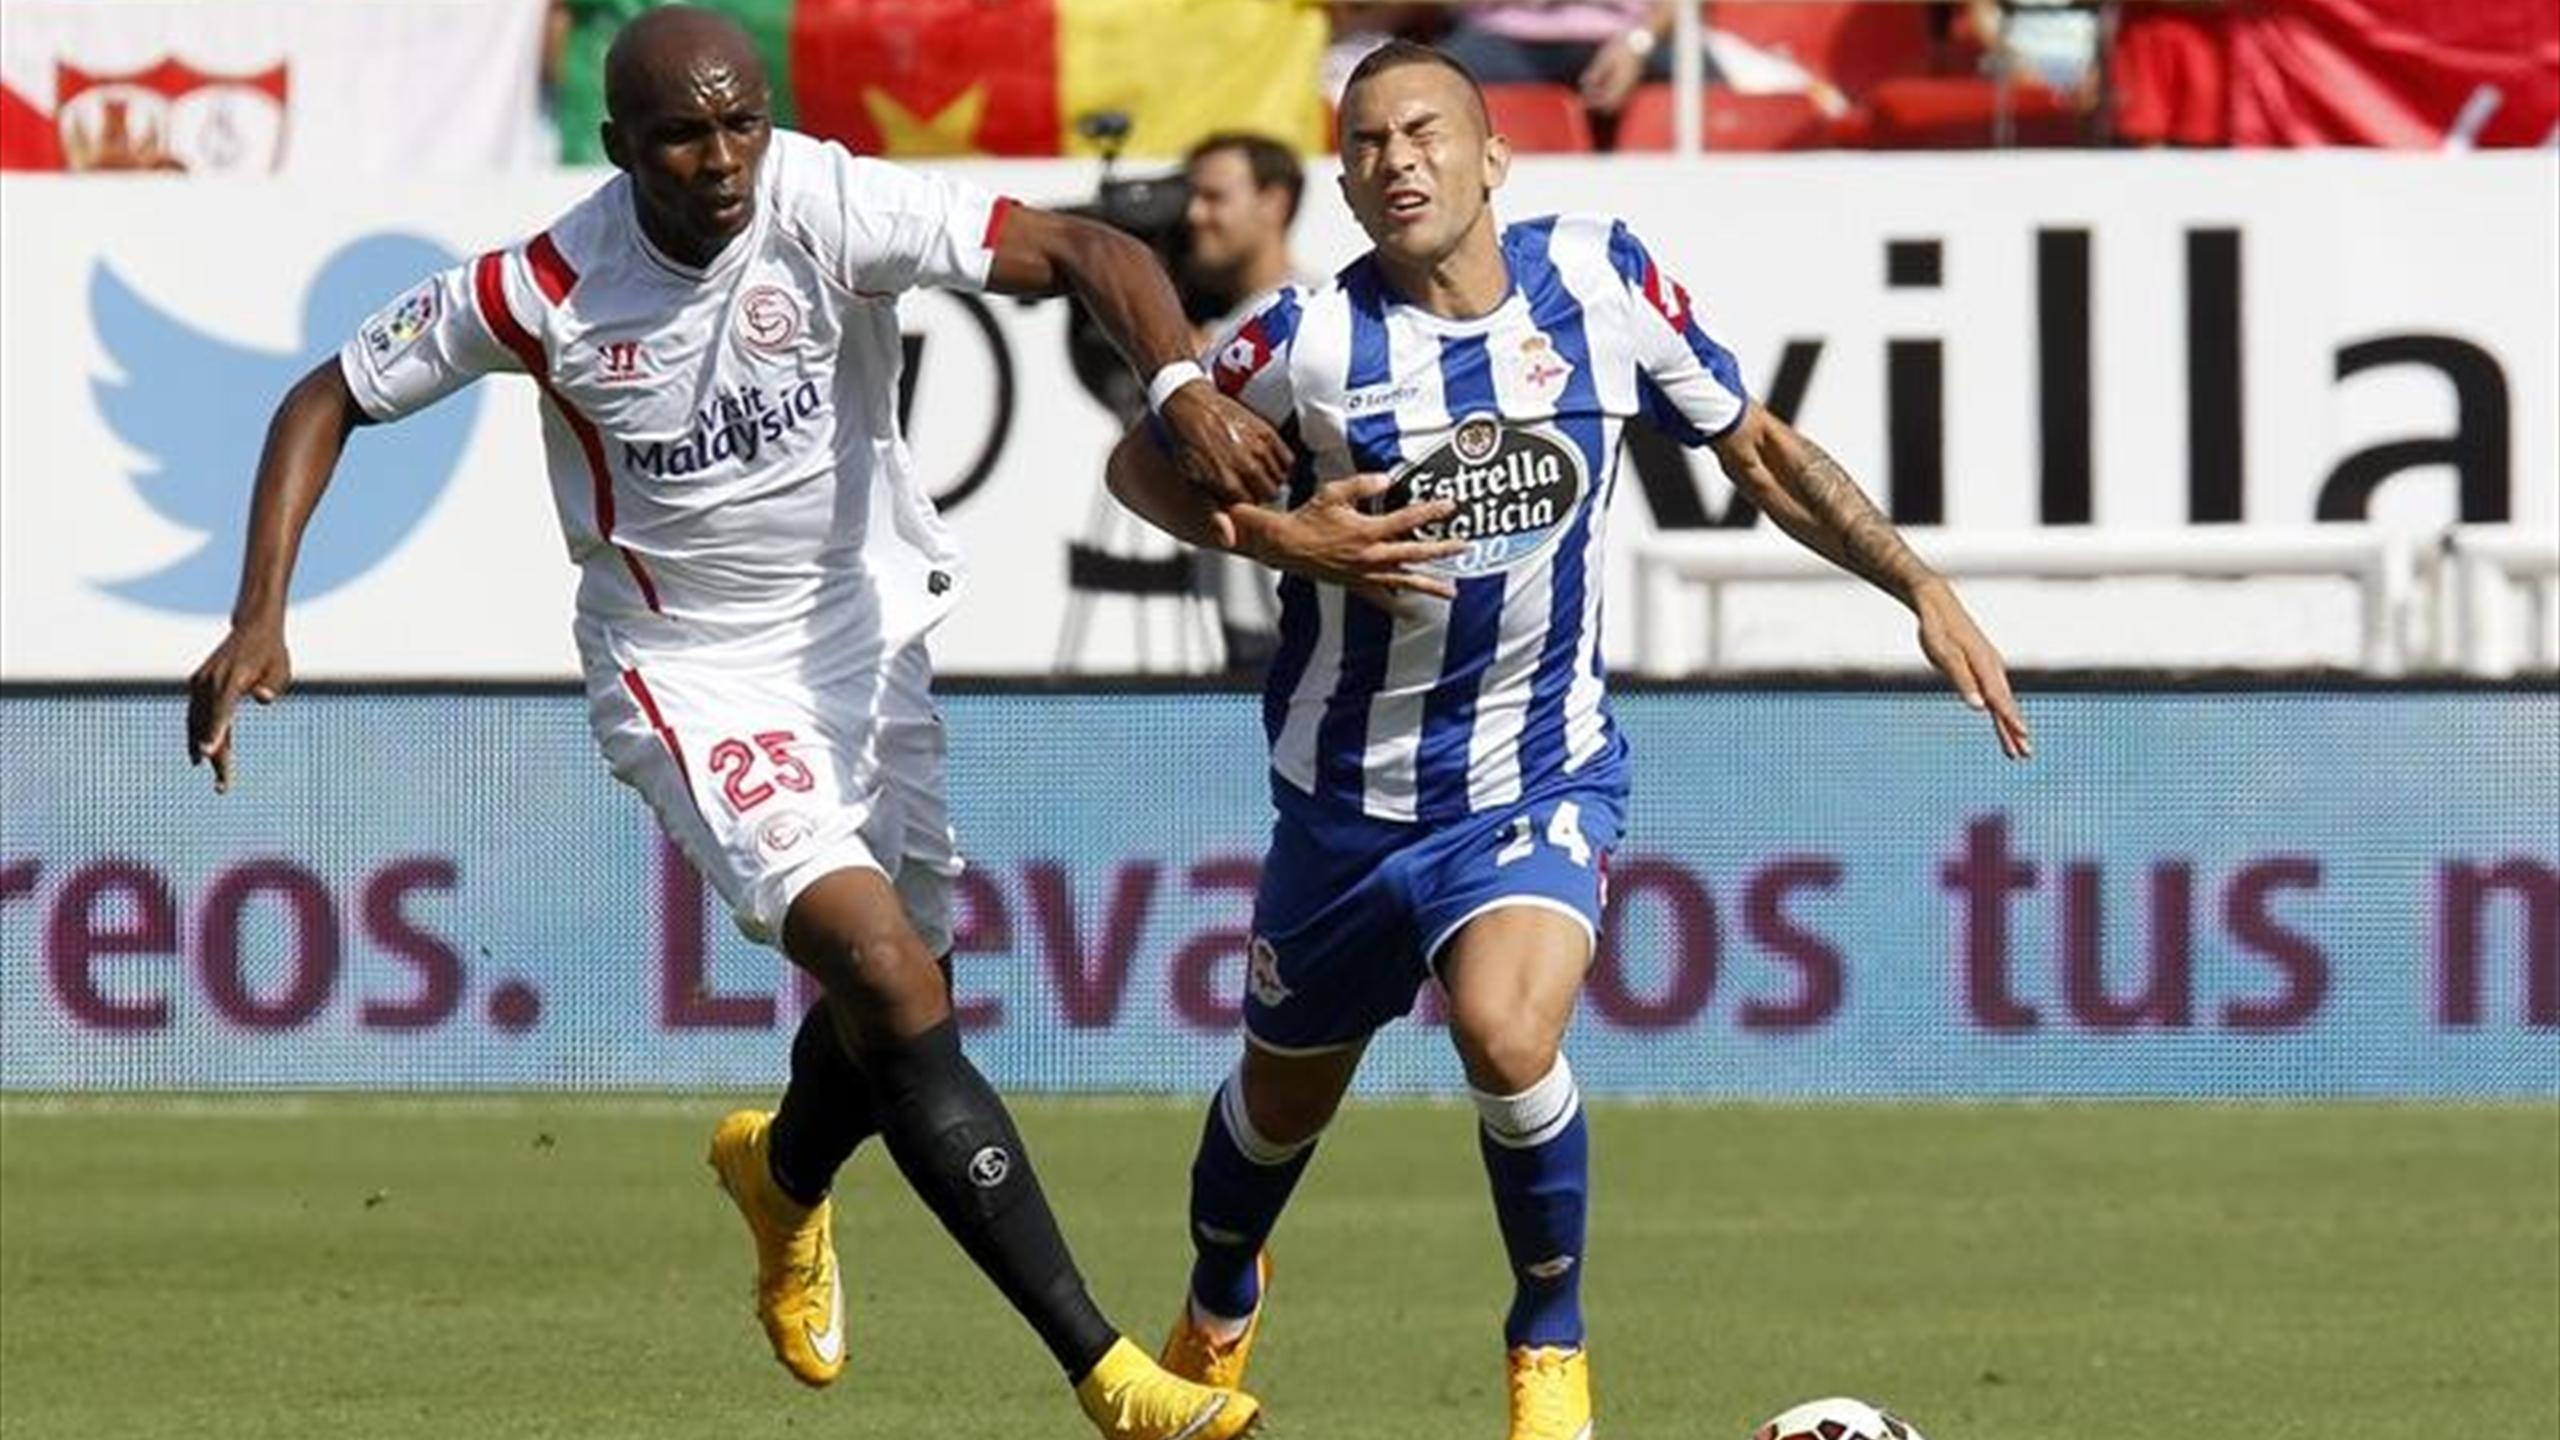 Video: Sevilla vs Deportivo La Coruna